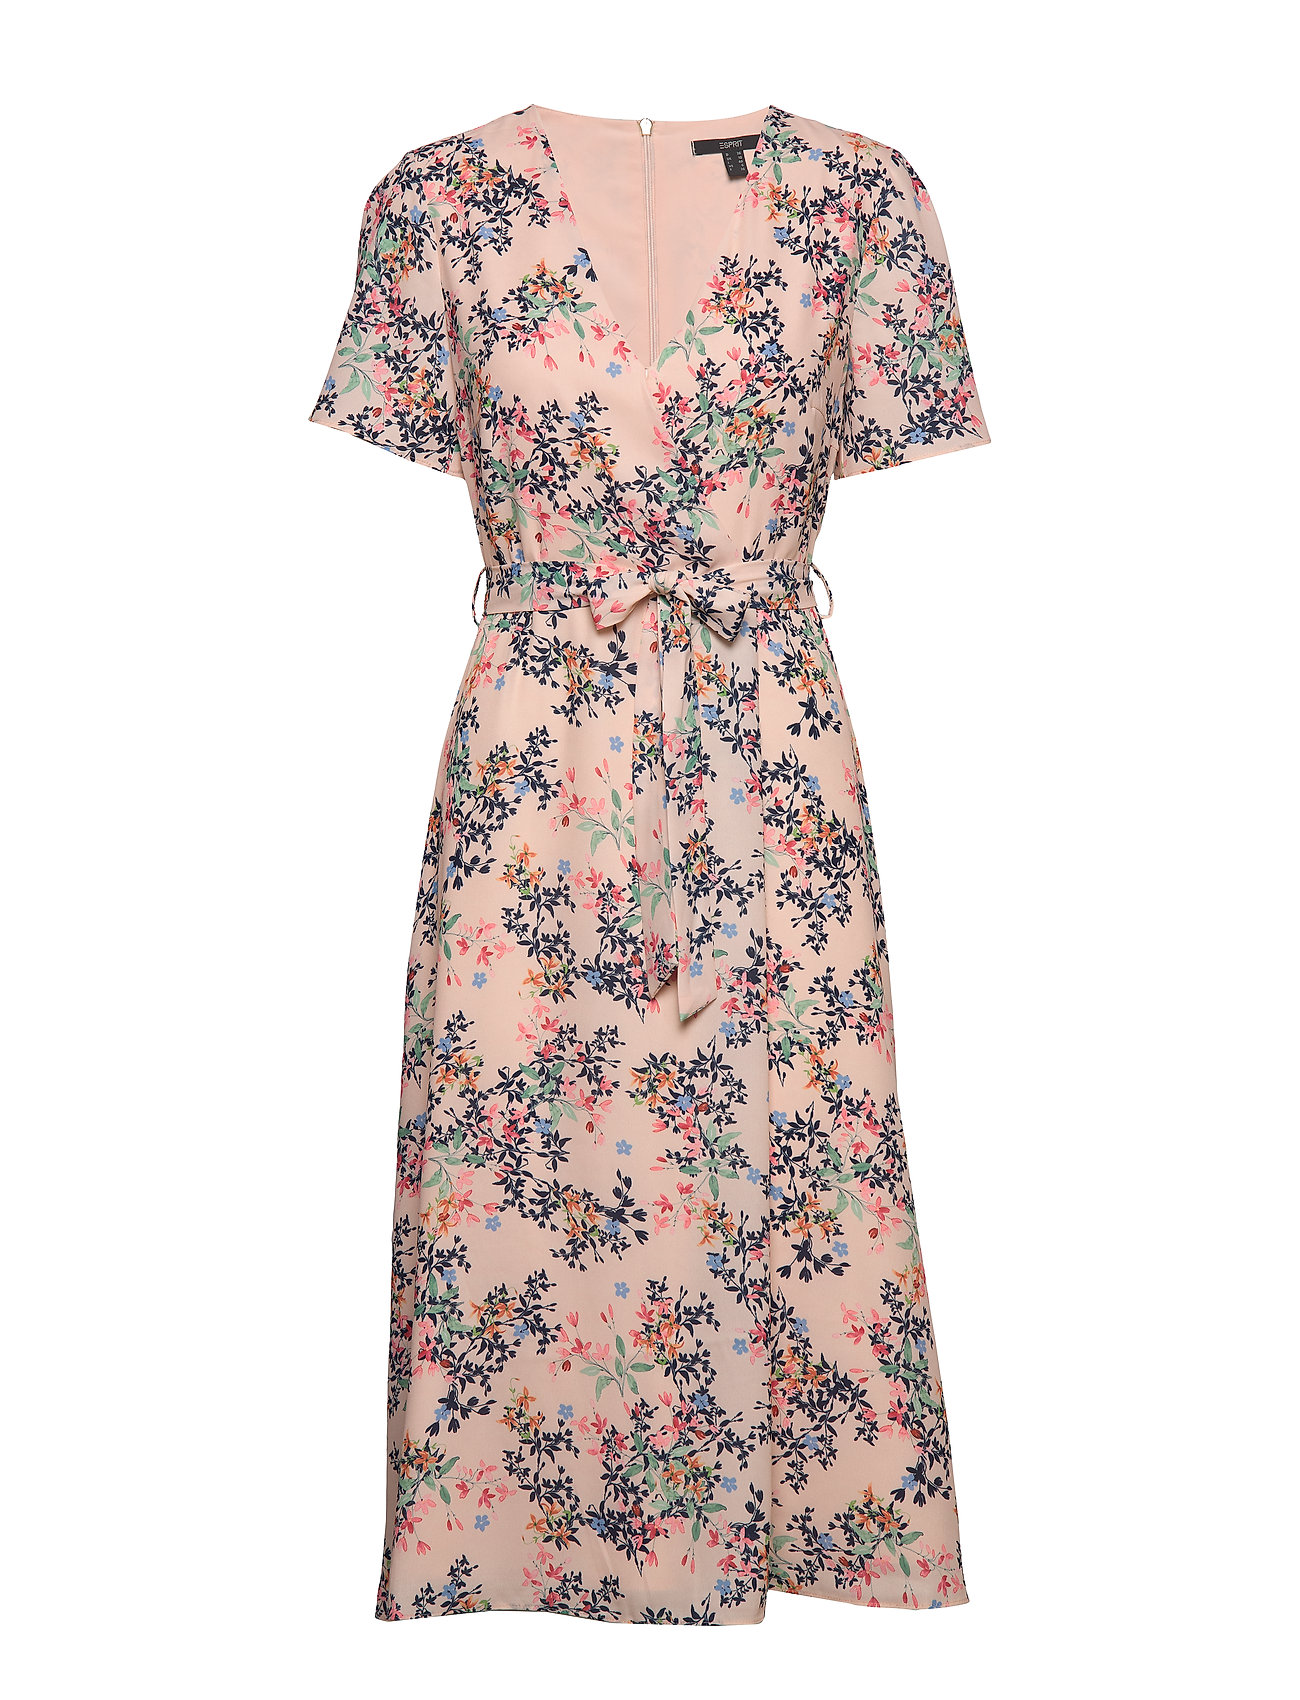 Esprit Collection Dresses light woven - PASTEL PINK 4